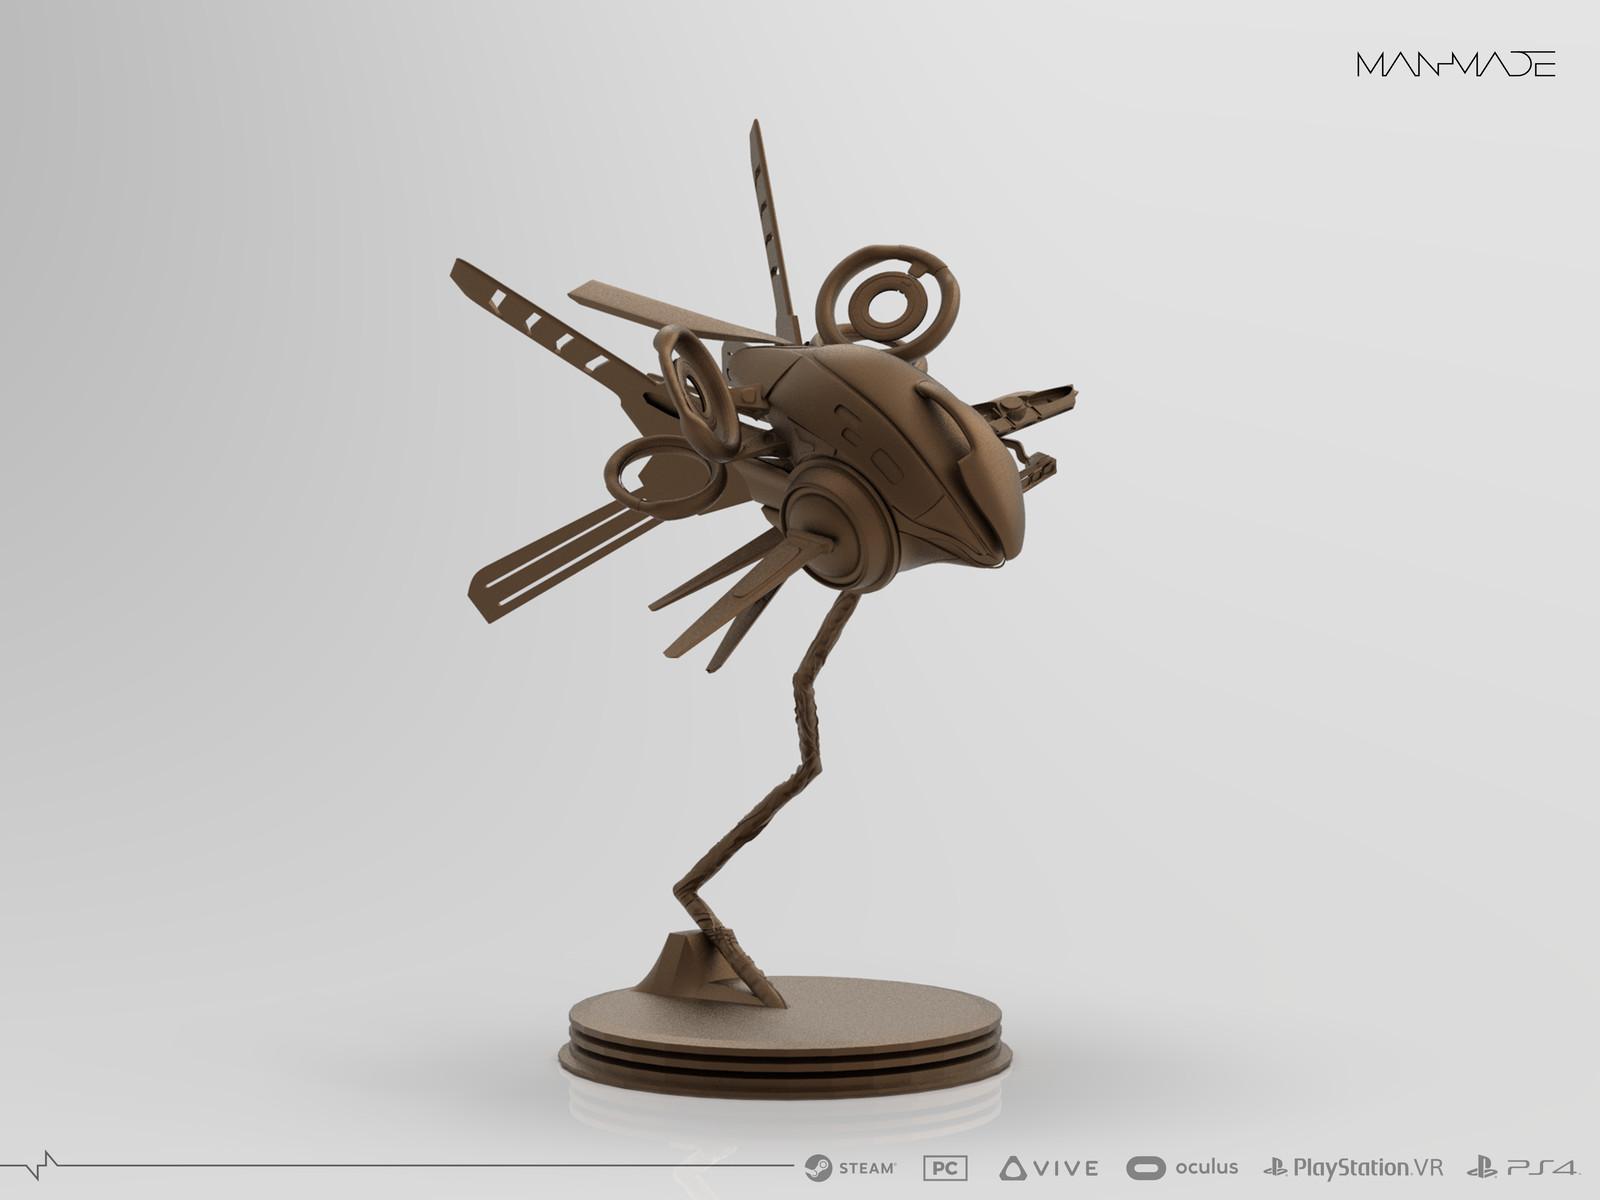 Drone Statue Design for Kickstarter Reward for ManMade: SciFi Action Adventure Game (12cm)